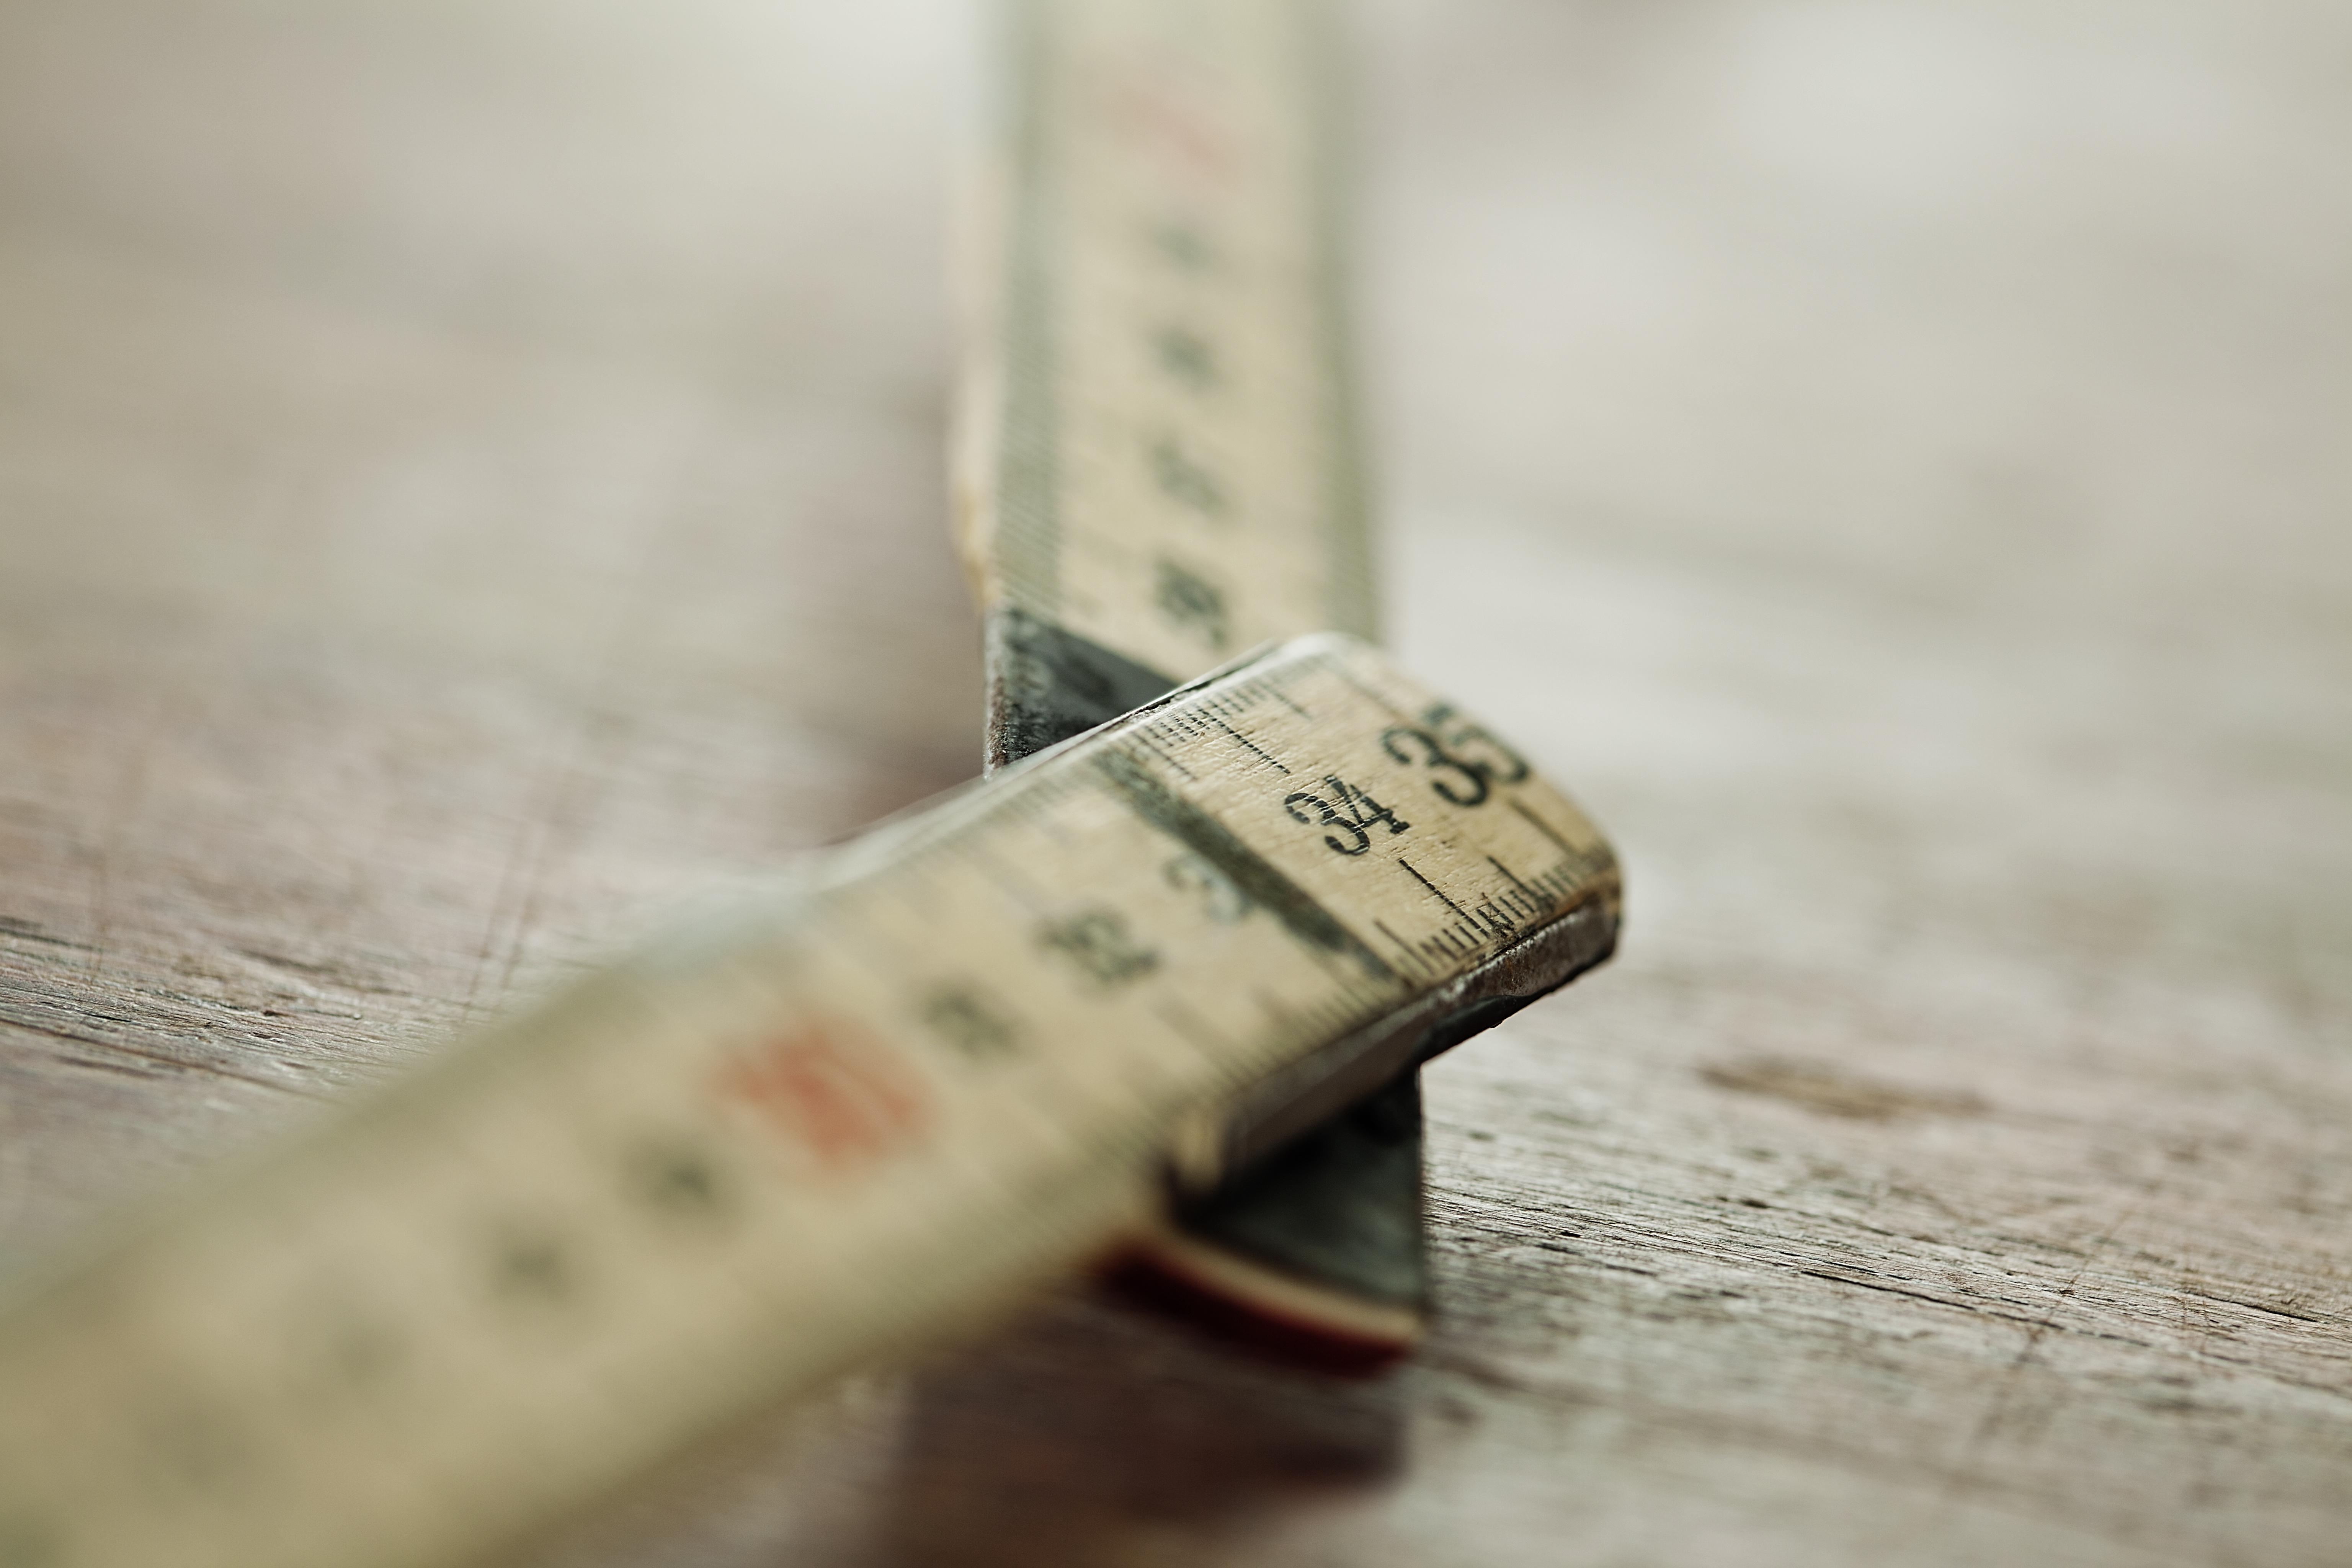 measuring_tool